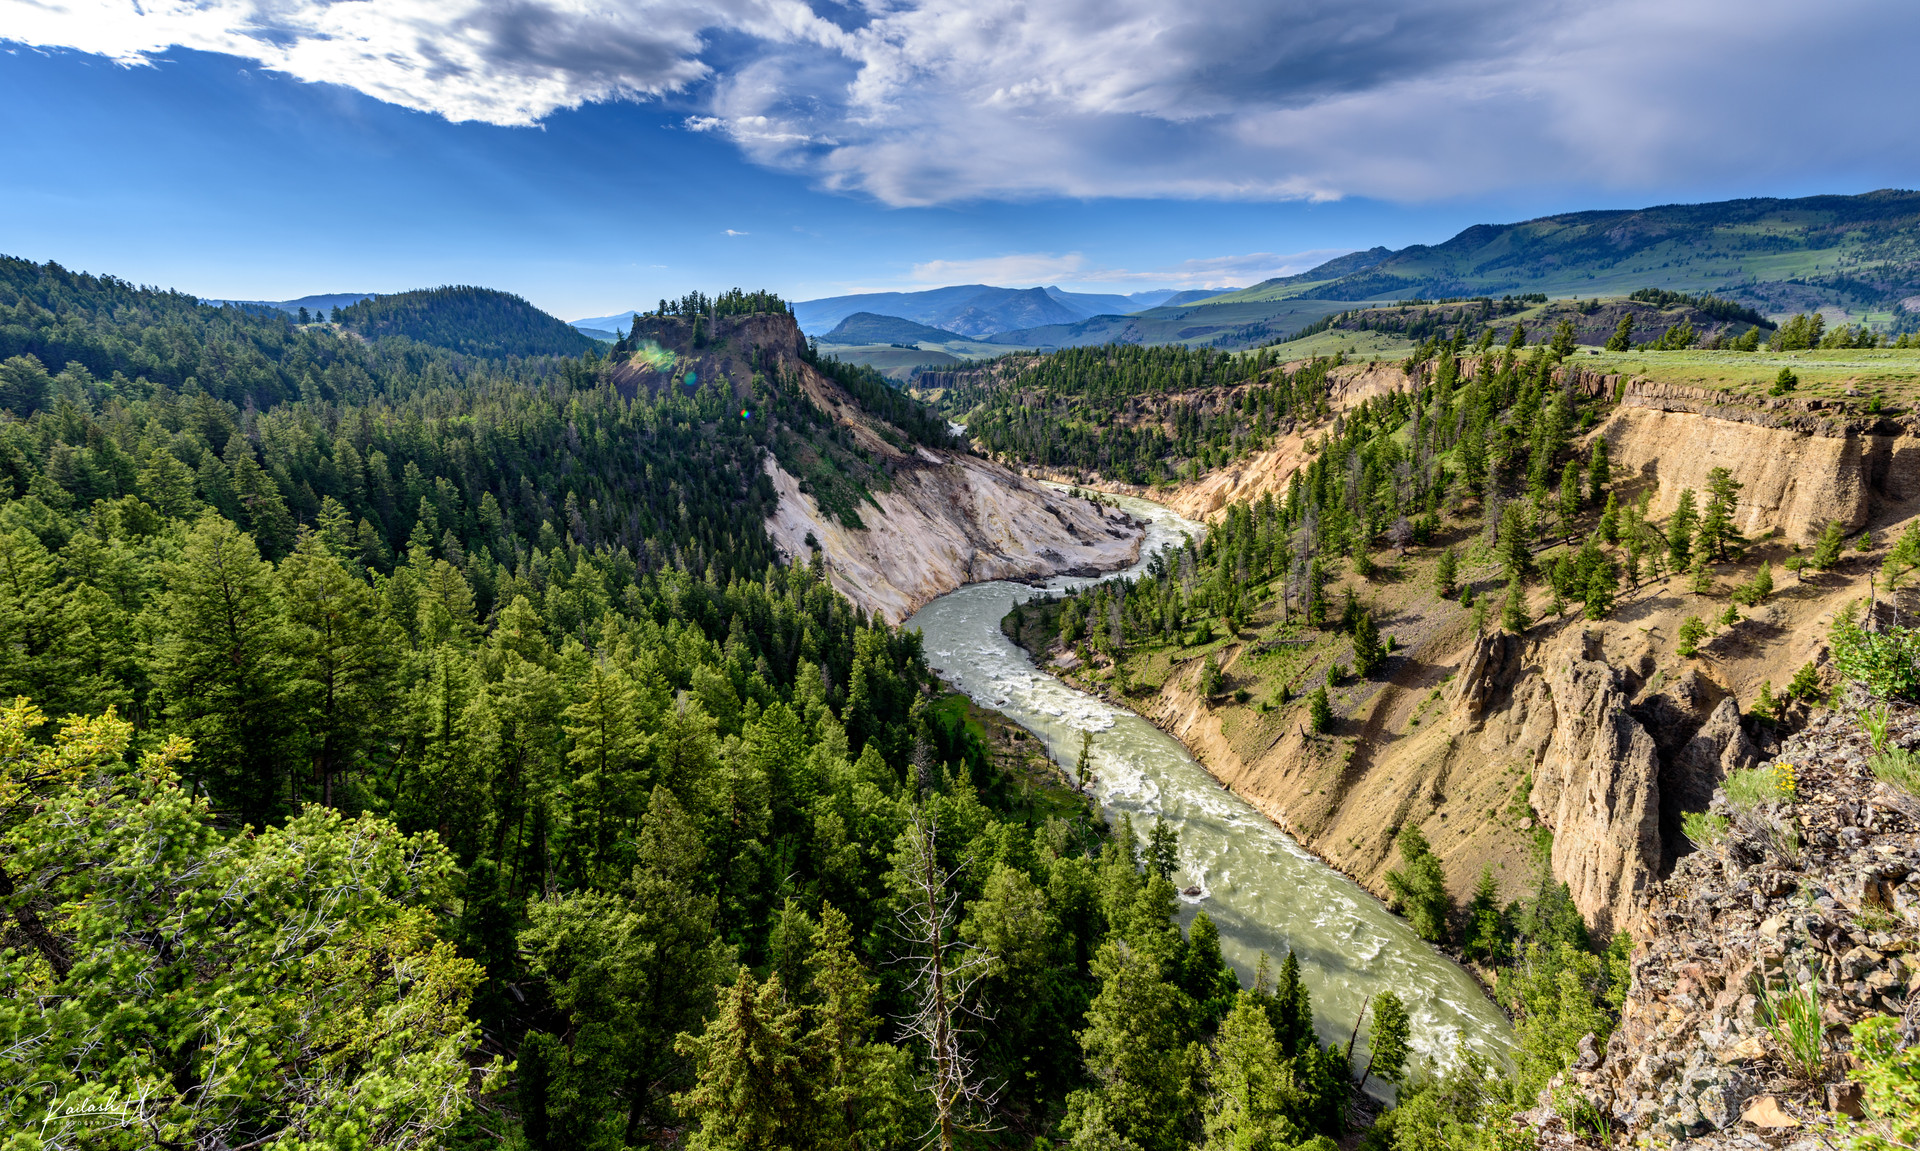 Twists & Turns, Yellowstone